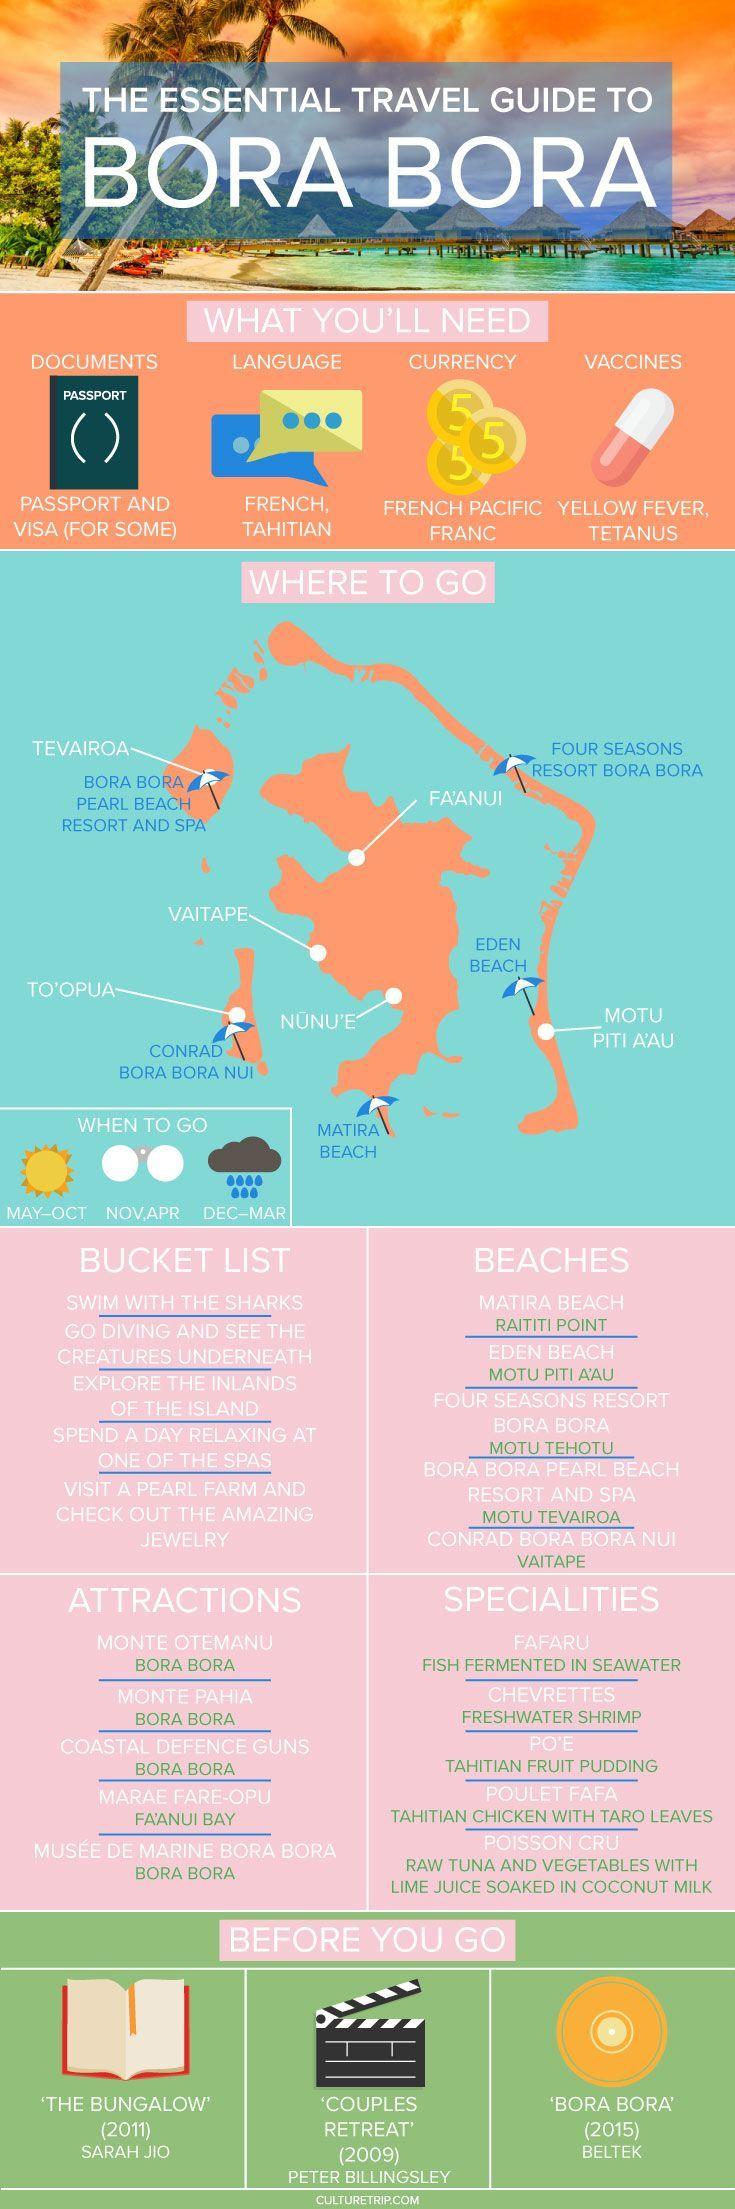 The Essential Travel Guide to Bora Bora (Infographic) | Pinterest: @theculturetrip